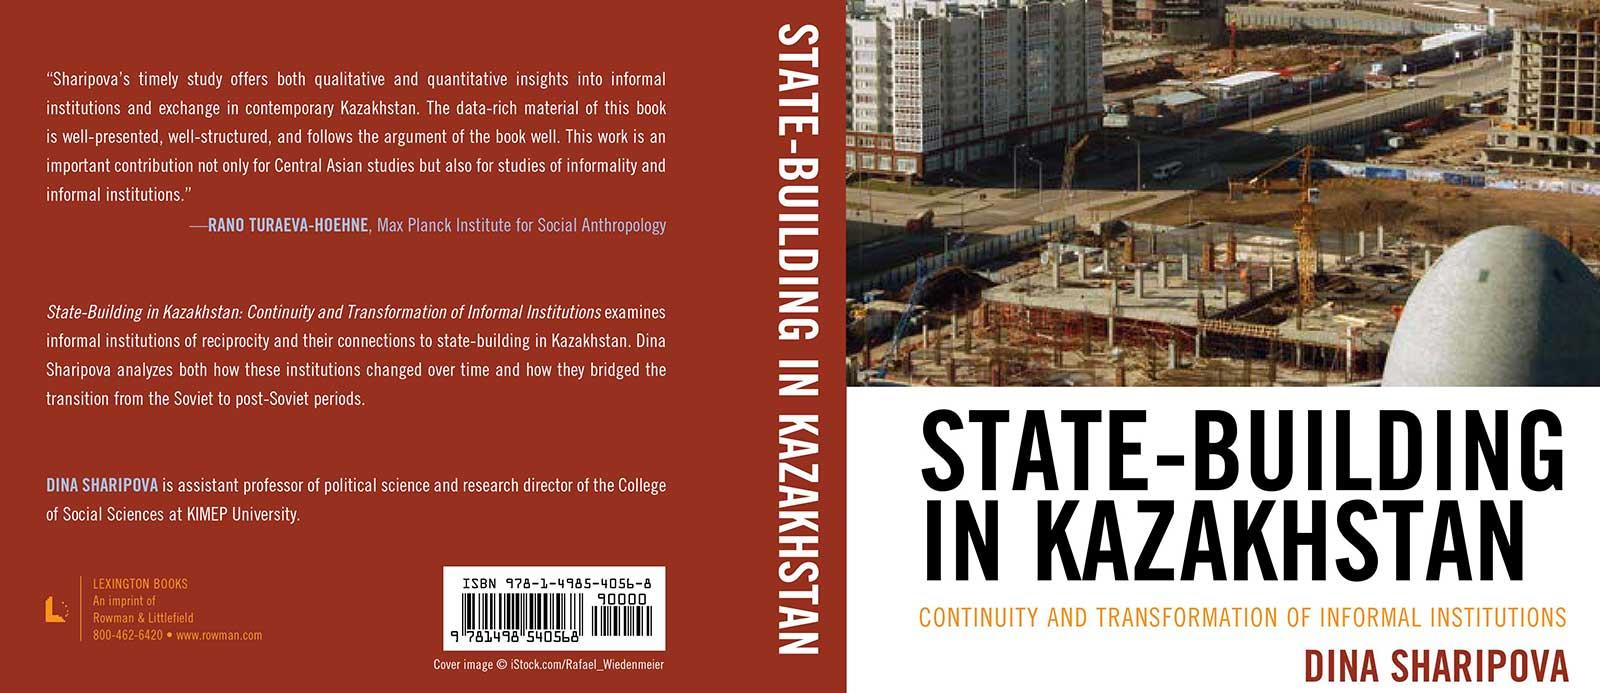 state-building-in-kazakhstan